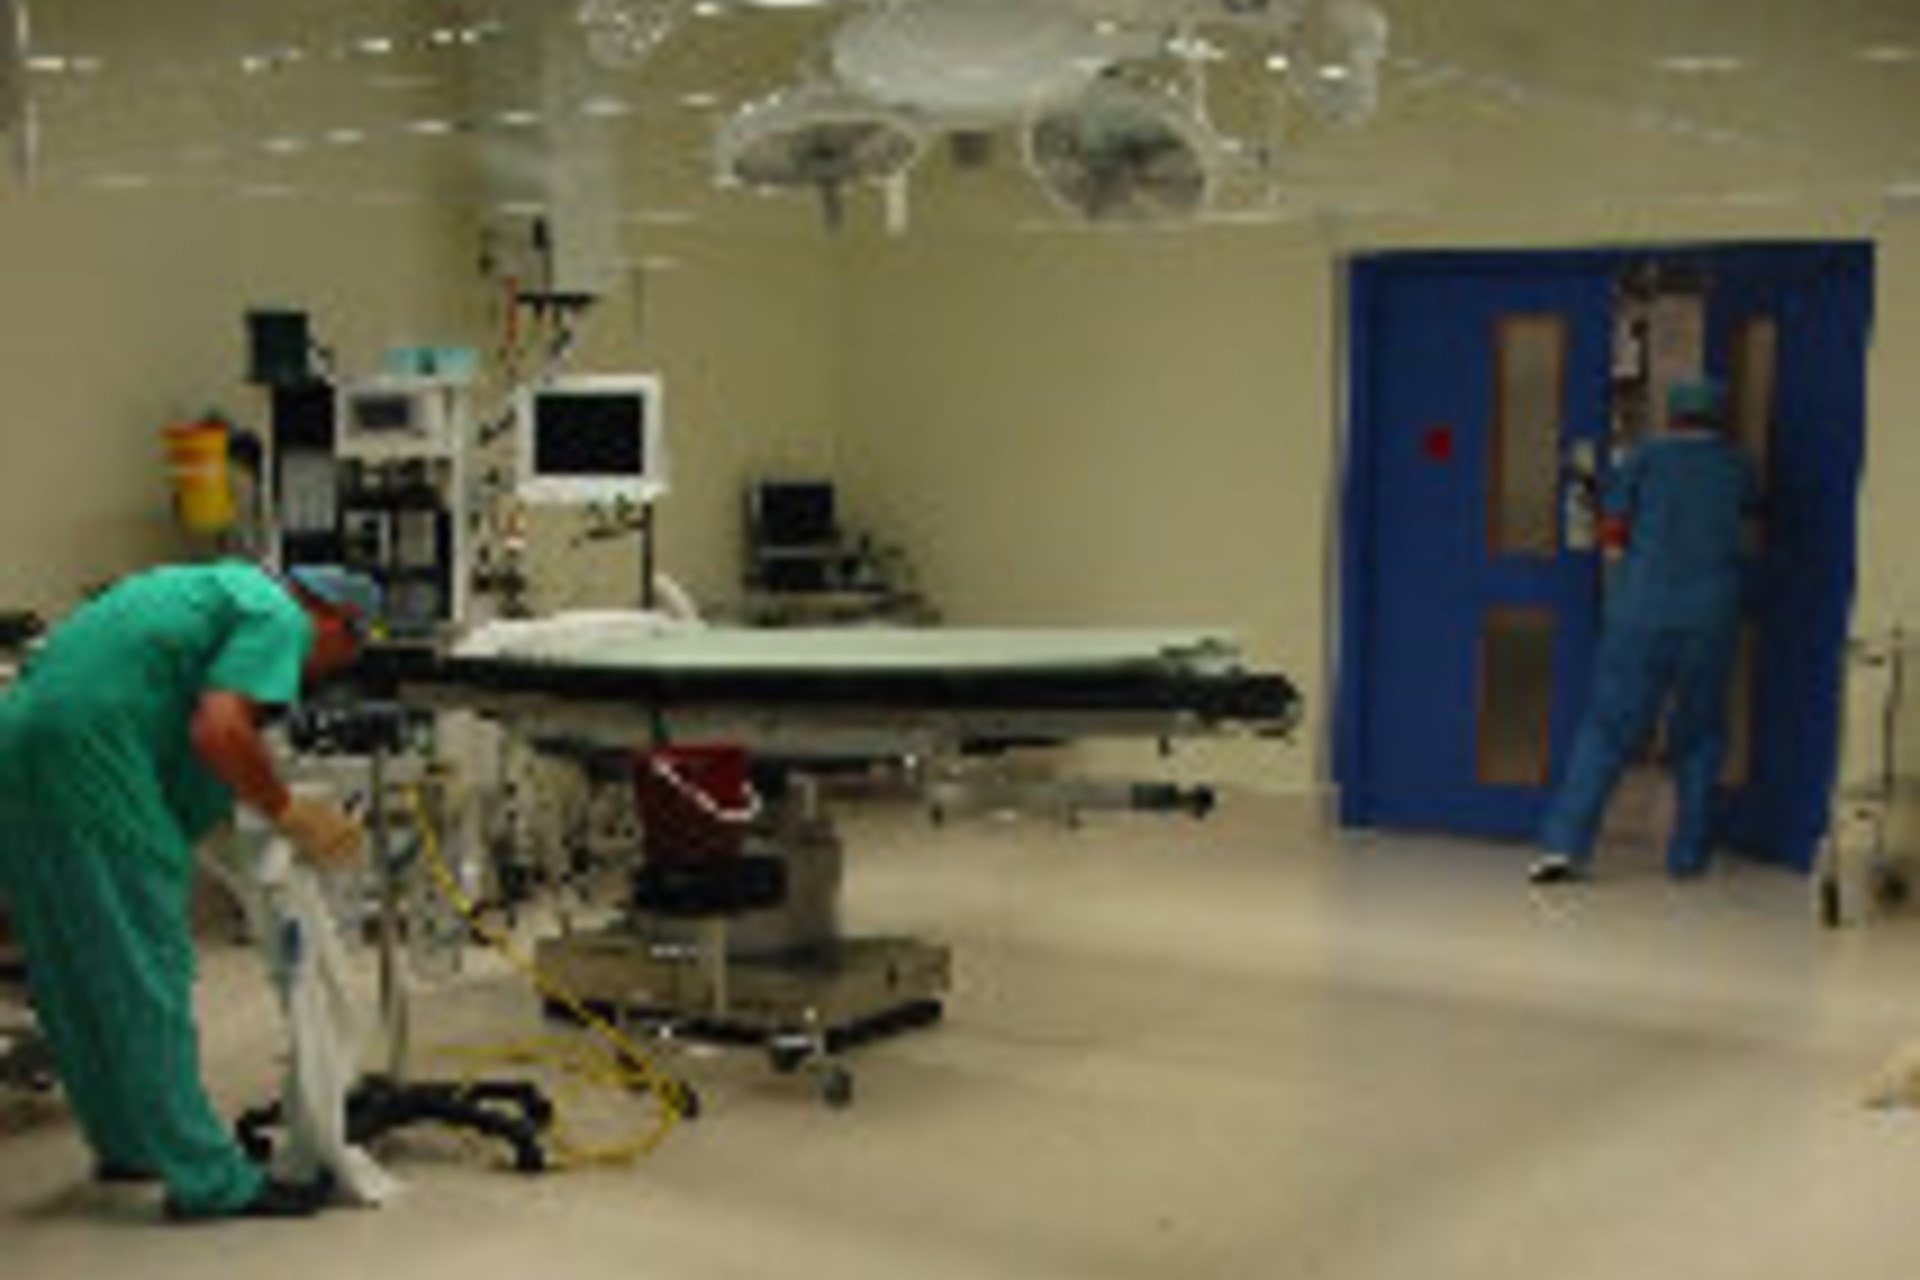 South Devon Healthcare Foundation Trust: Torbay Hospital, New Orthopaedic Theatre